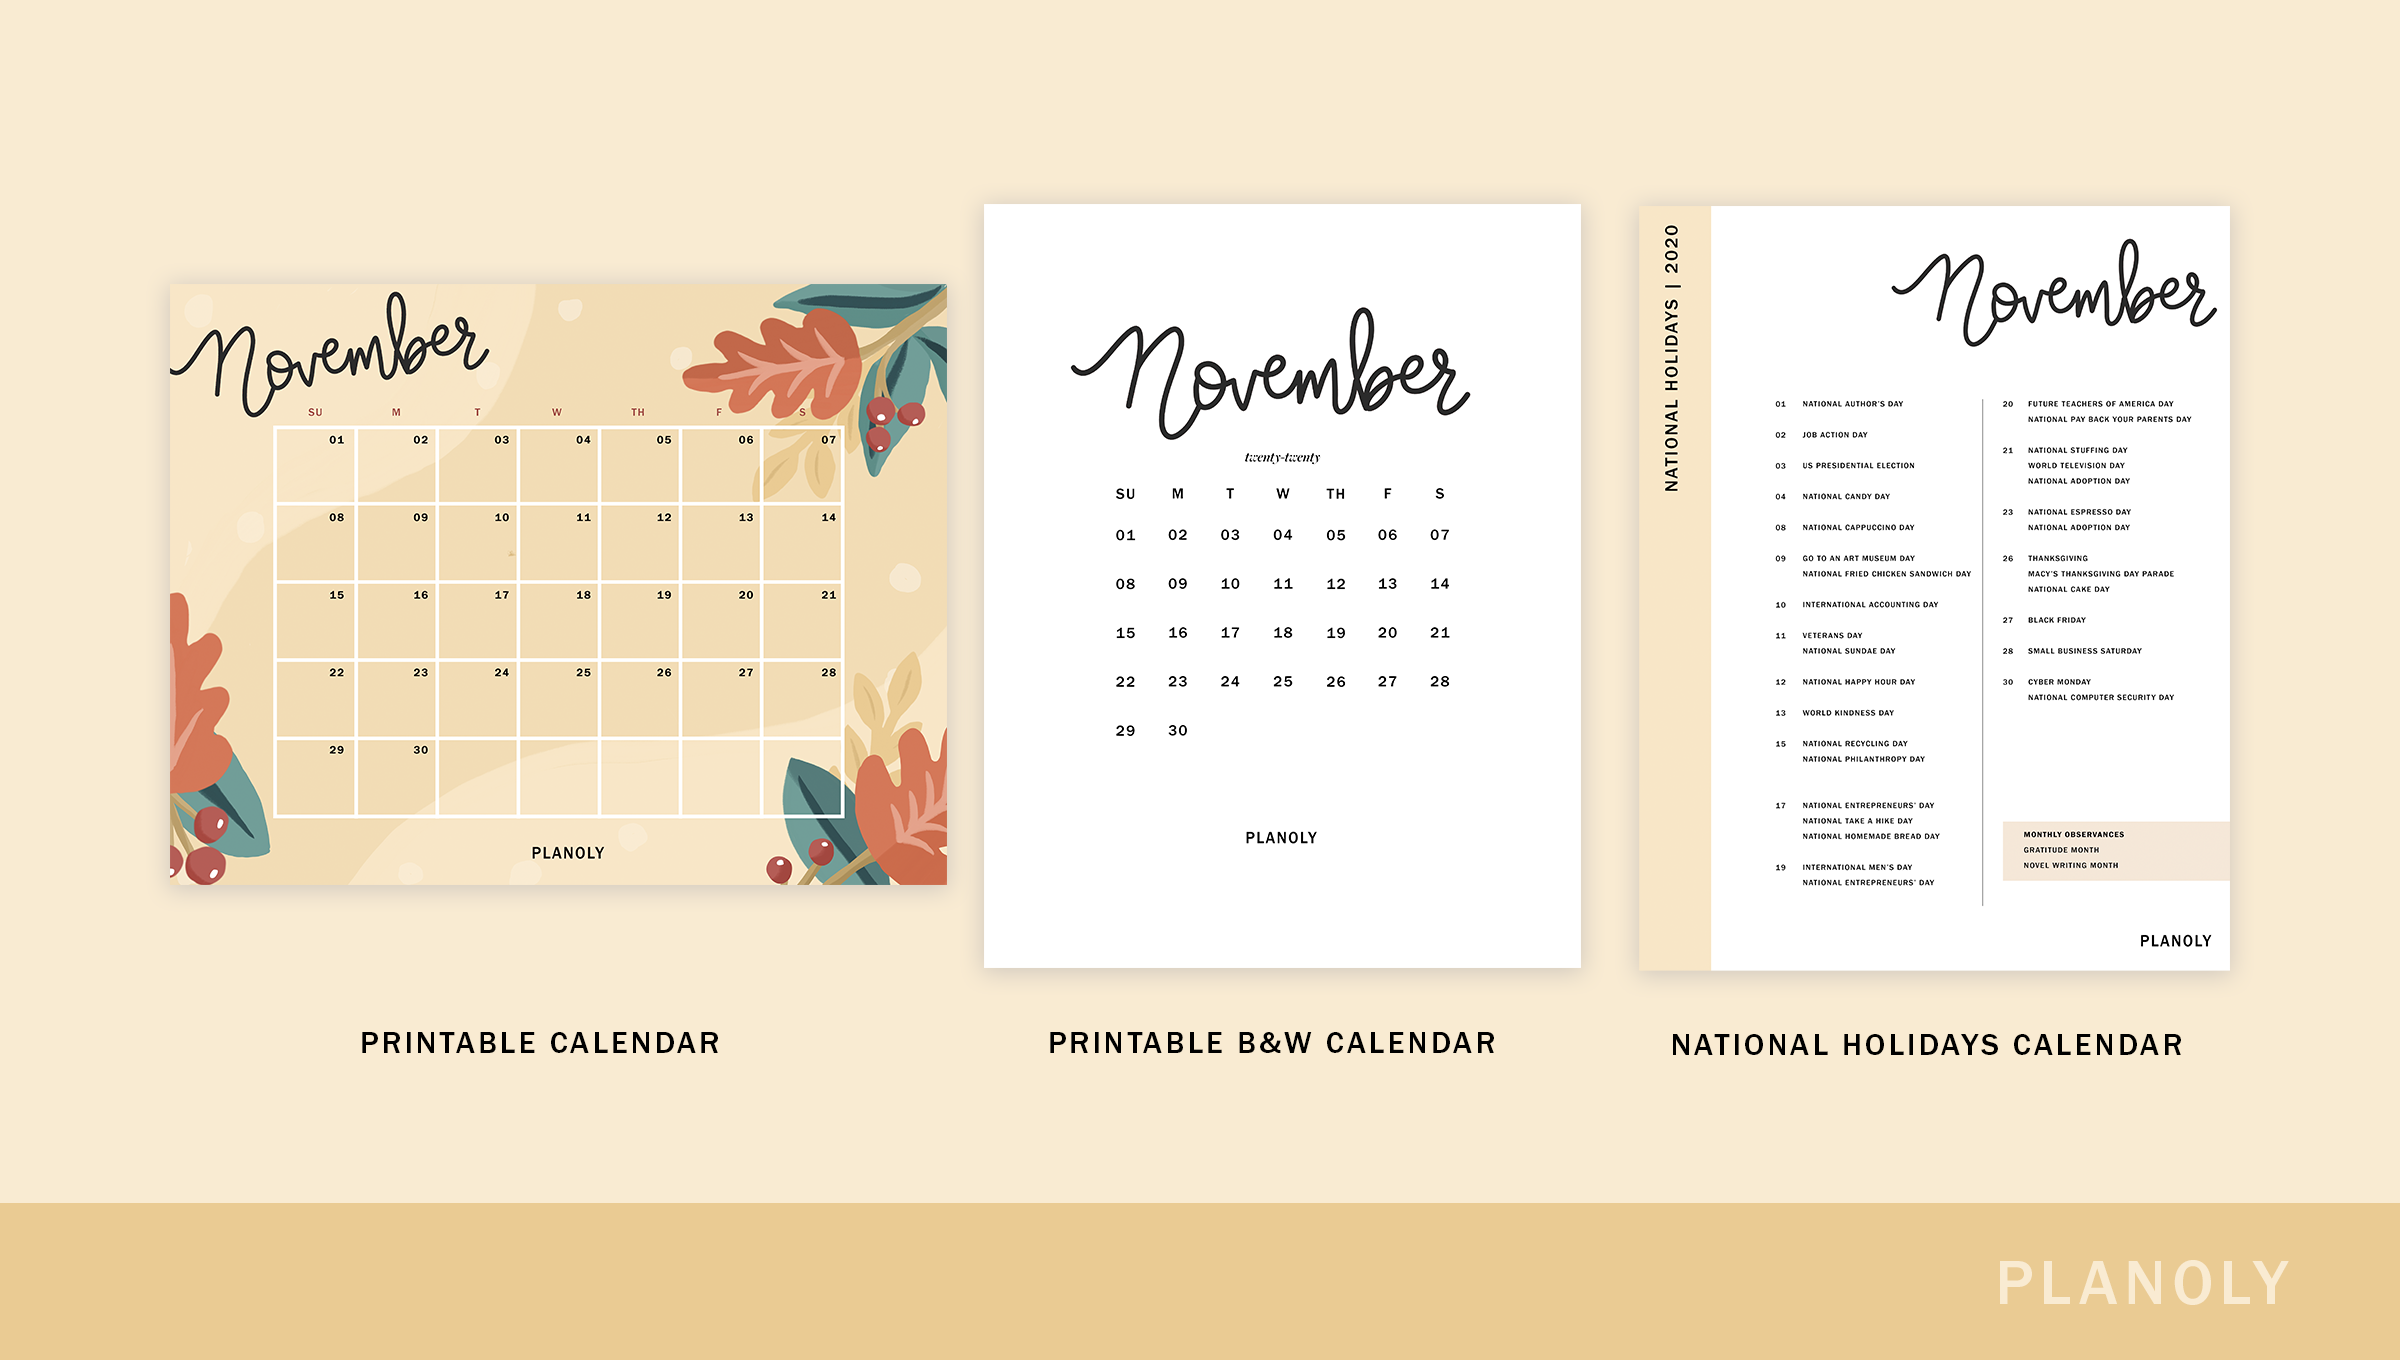 PLANOLY-blog post-Q4 2020 Content Calendars - Image 5 copy